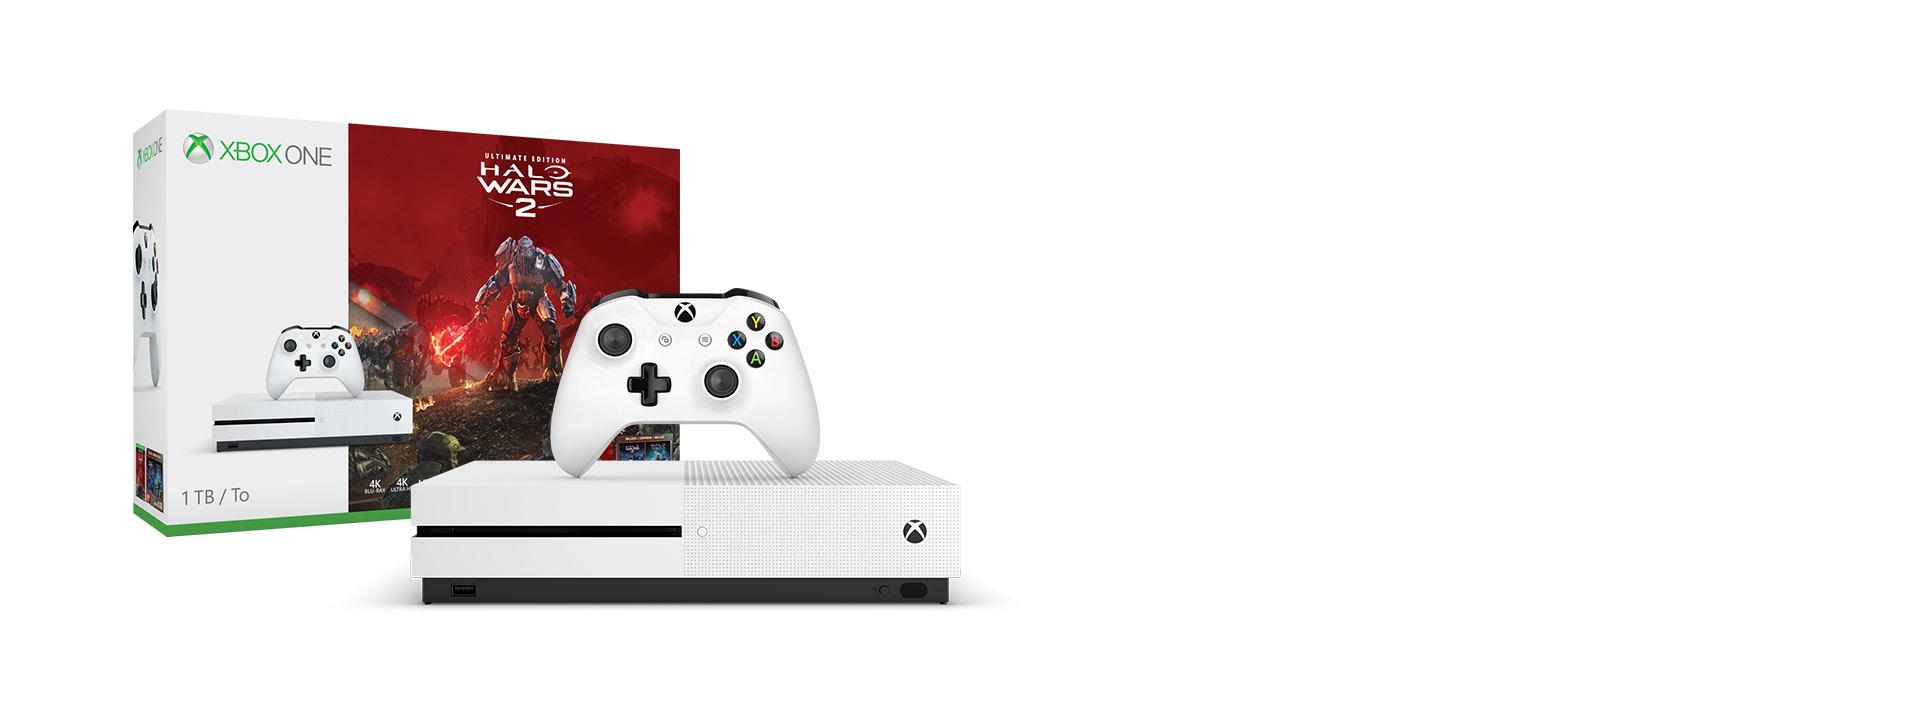 Xbox One S Halo Wars 2 (1TB)